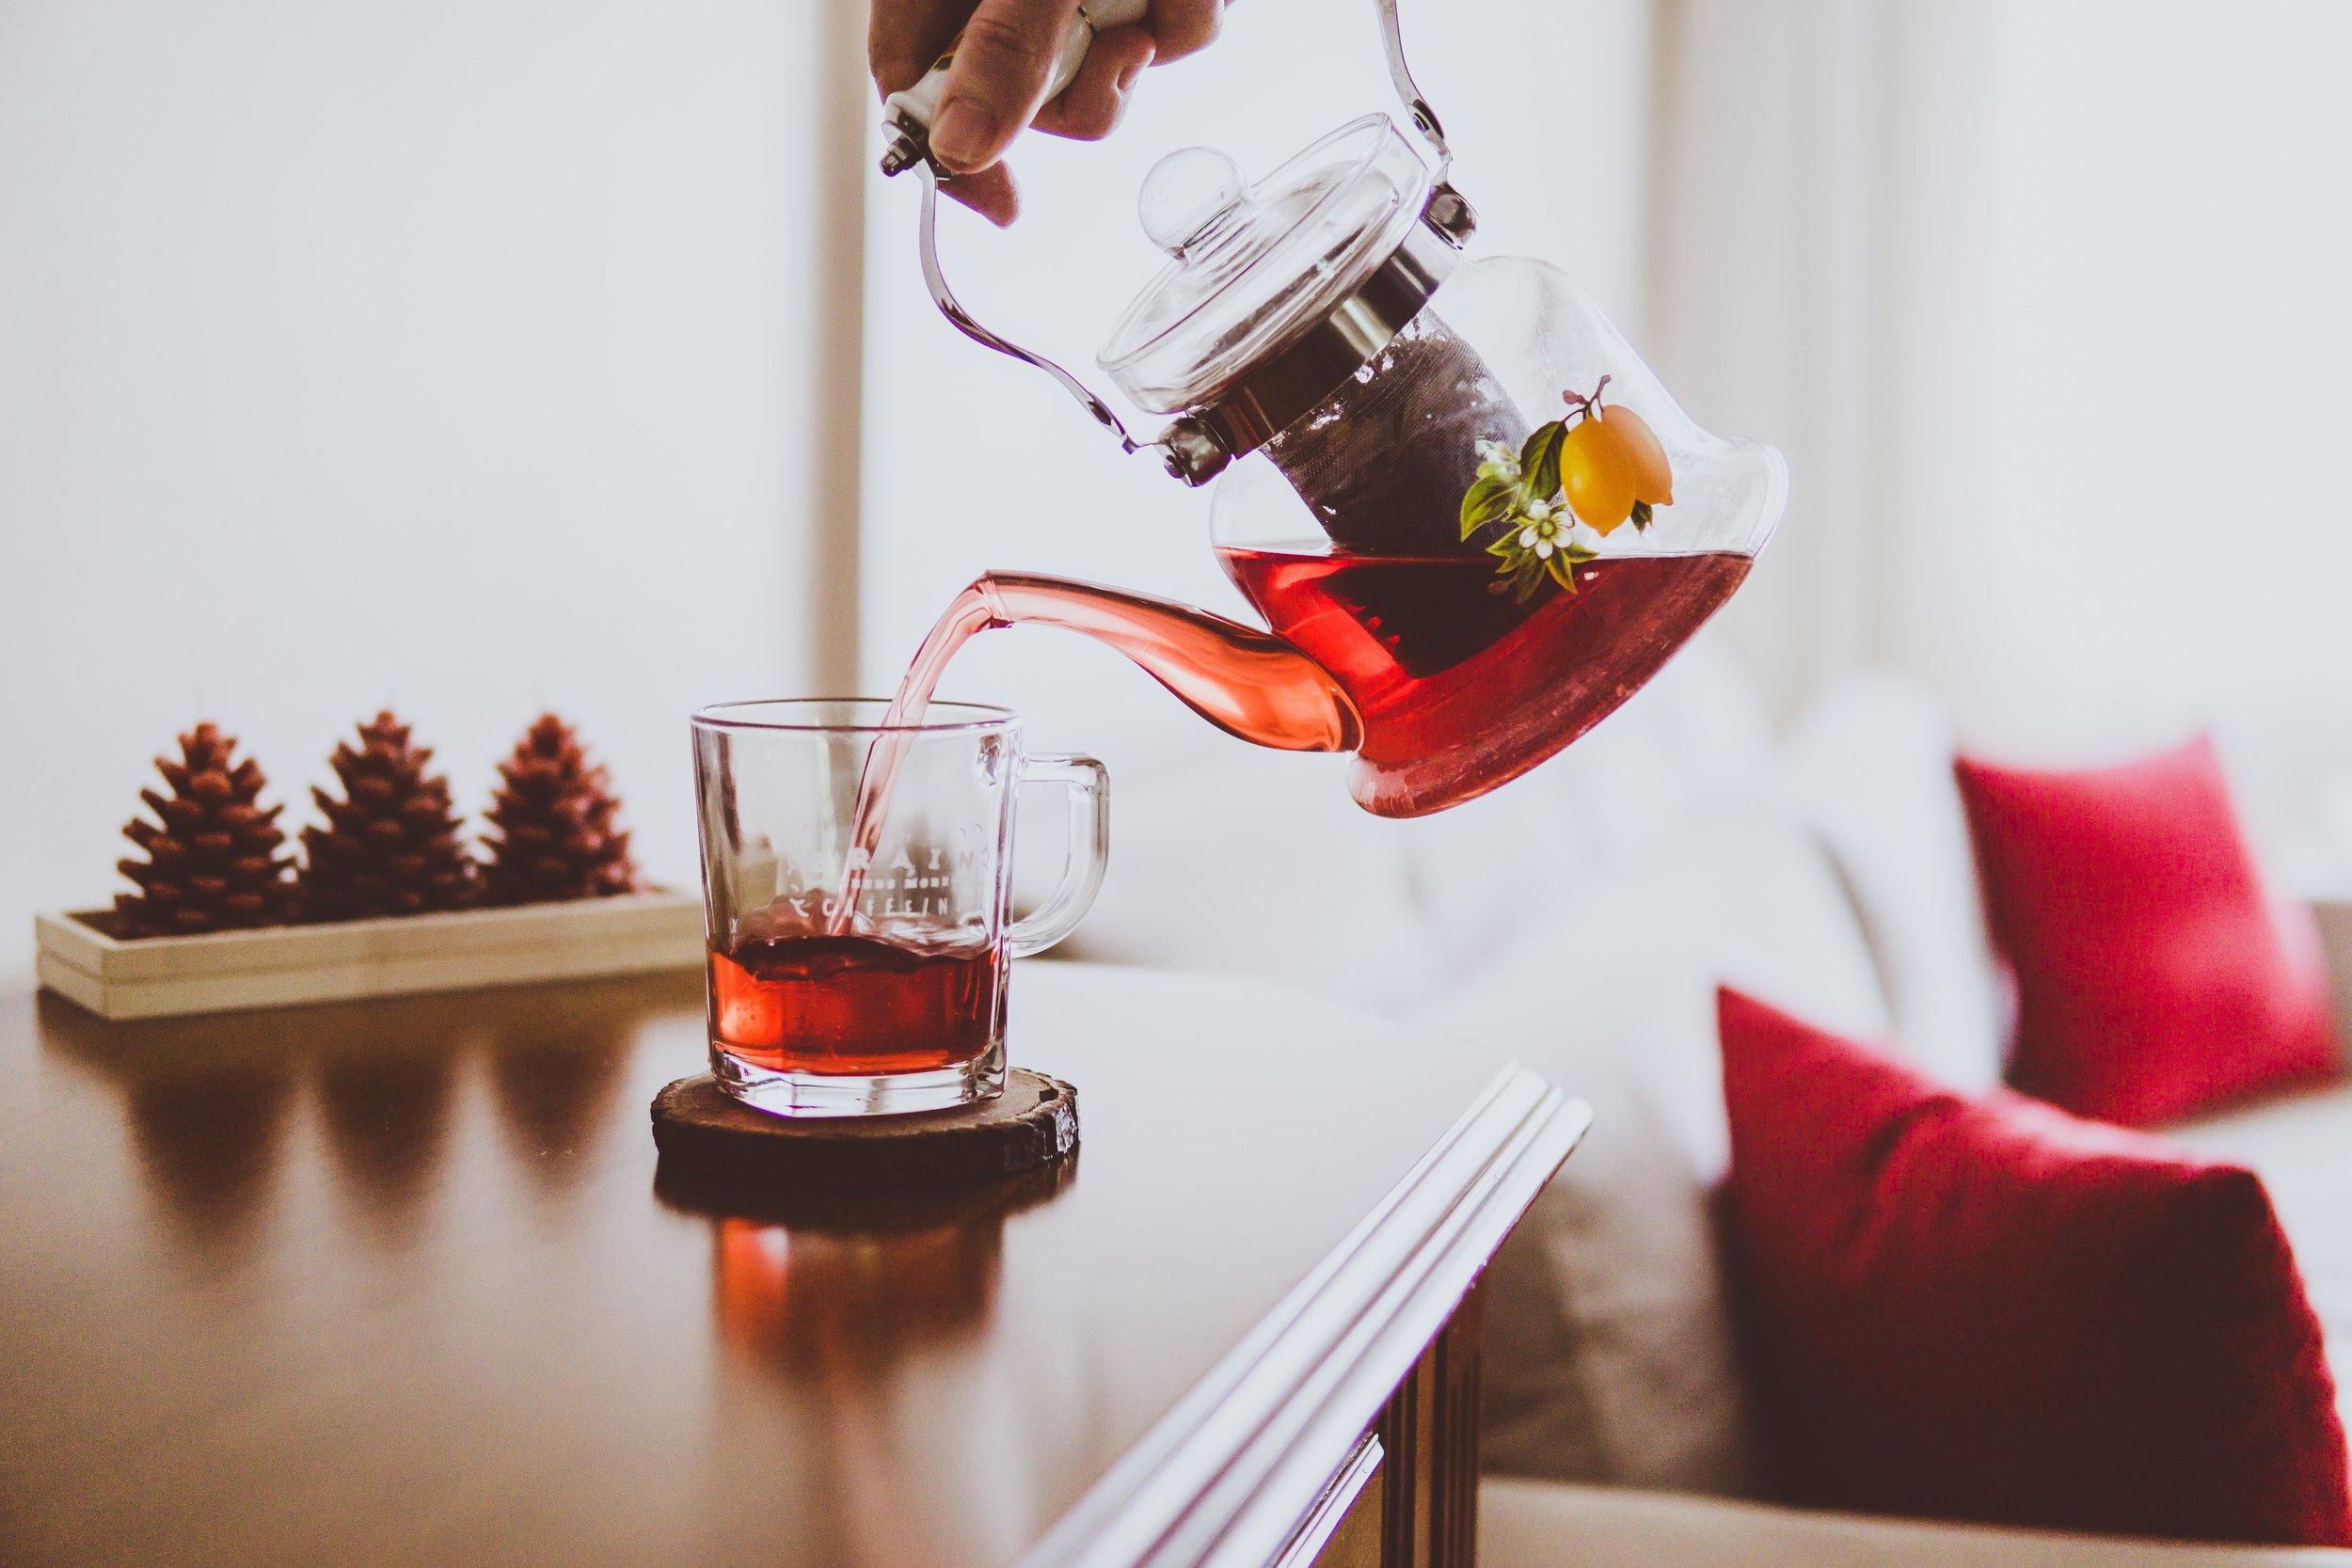 Berry-Fennel-Ginger Herbal Tea Recipe